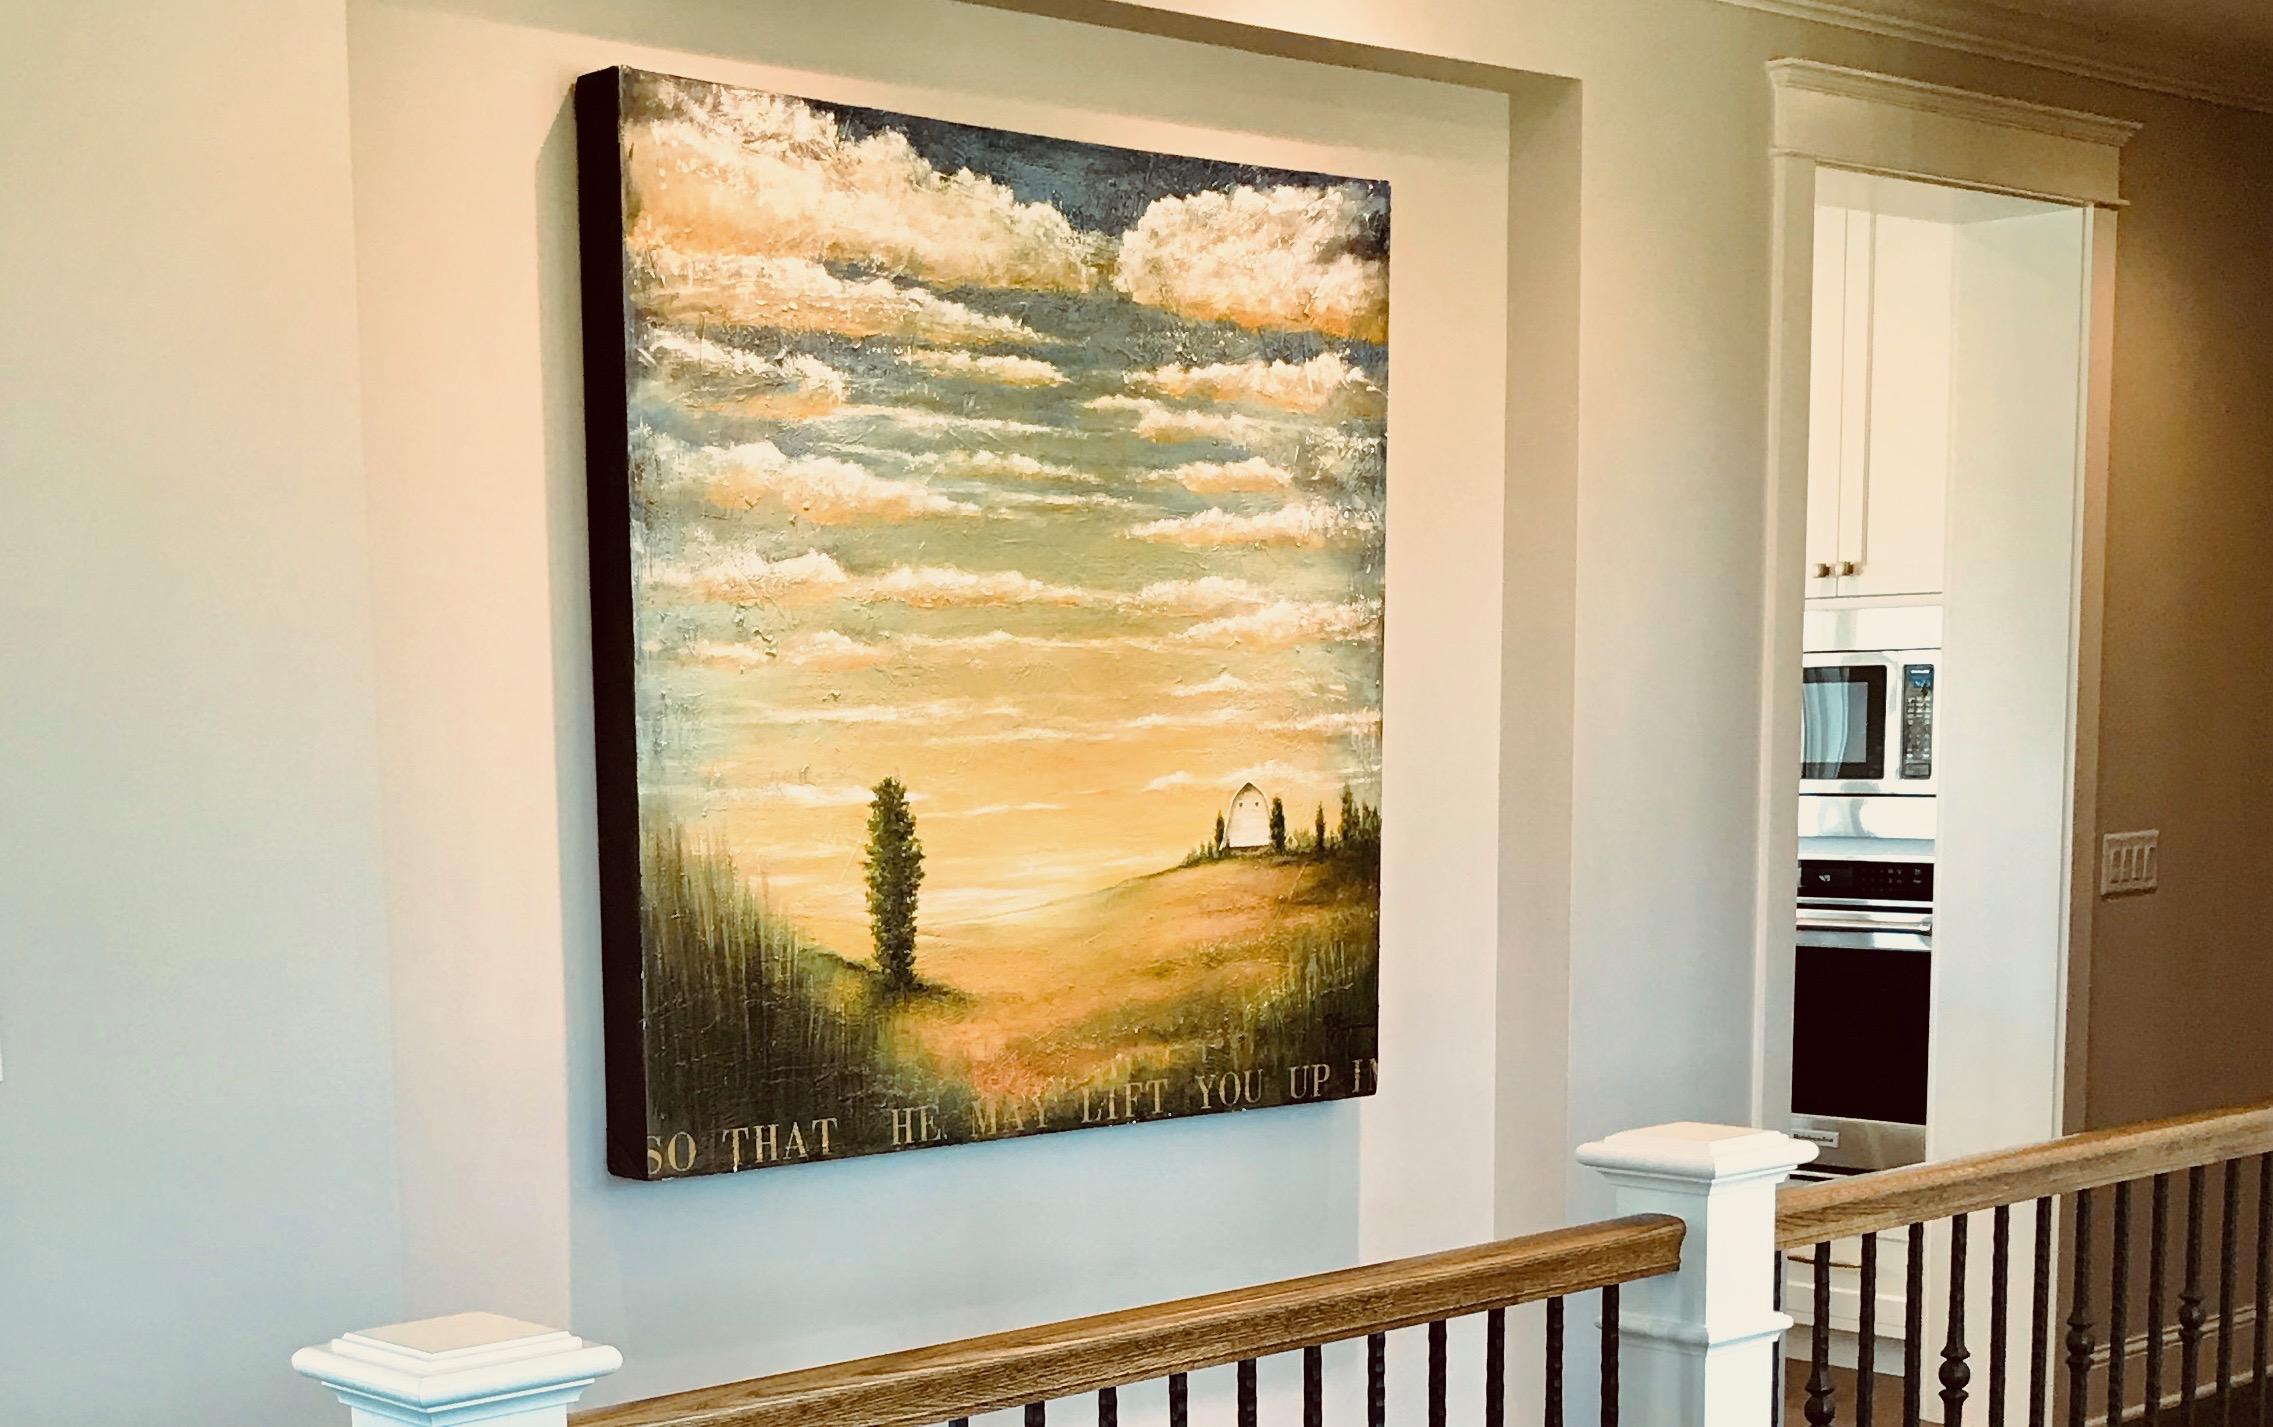 Lift you up Scott Sample Art room